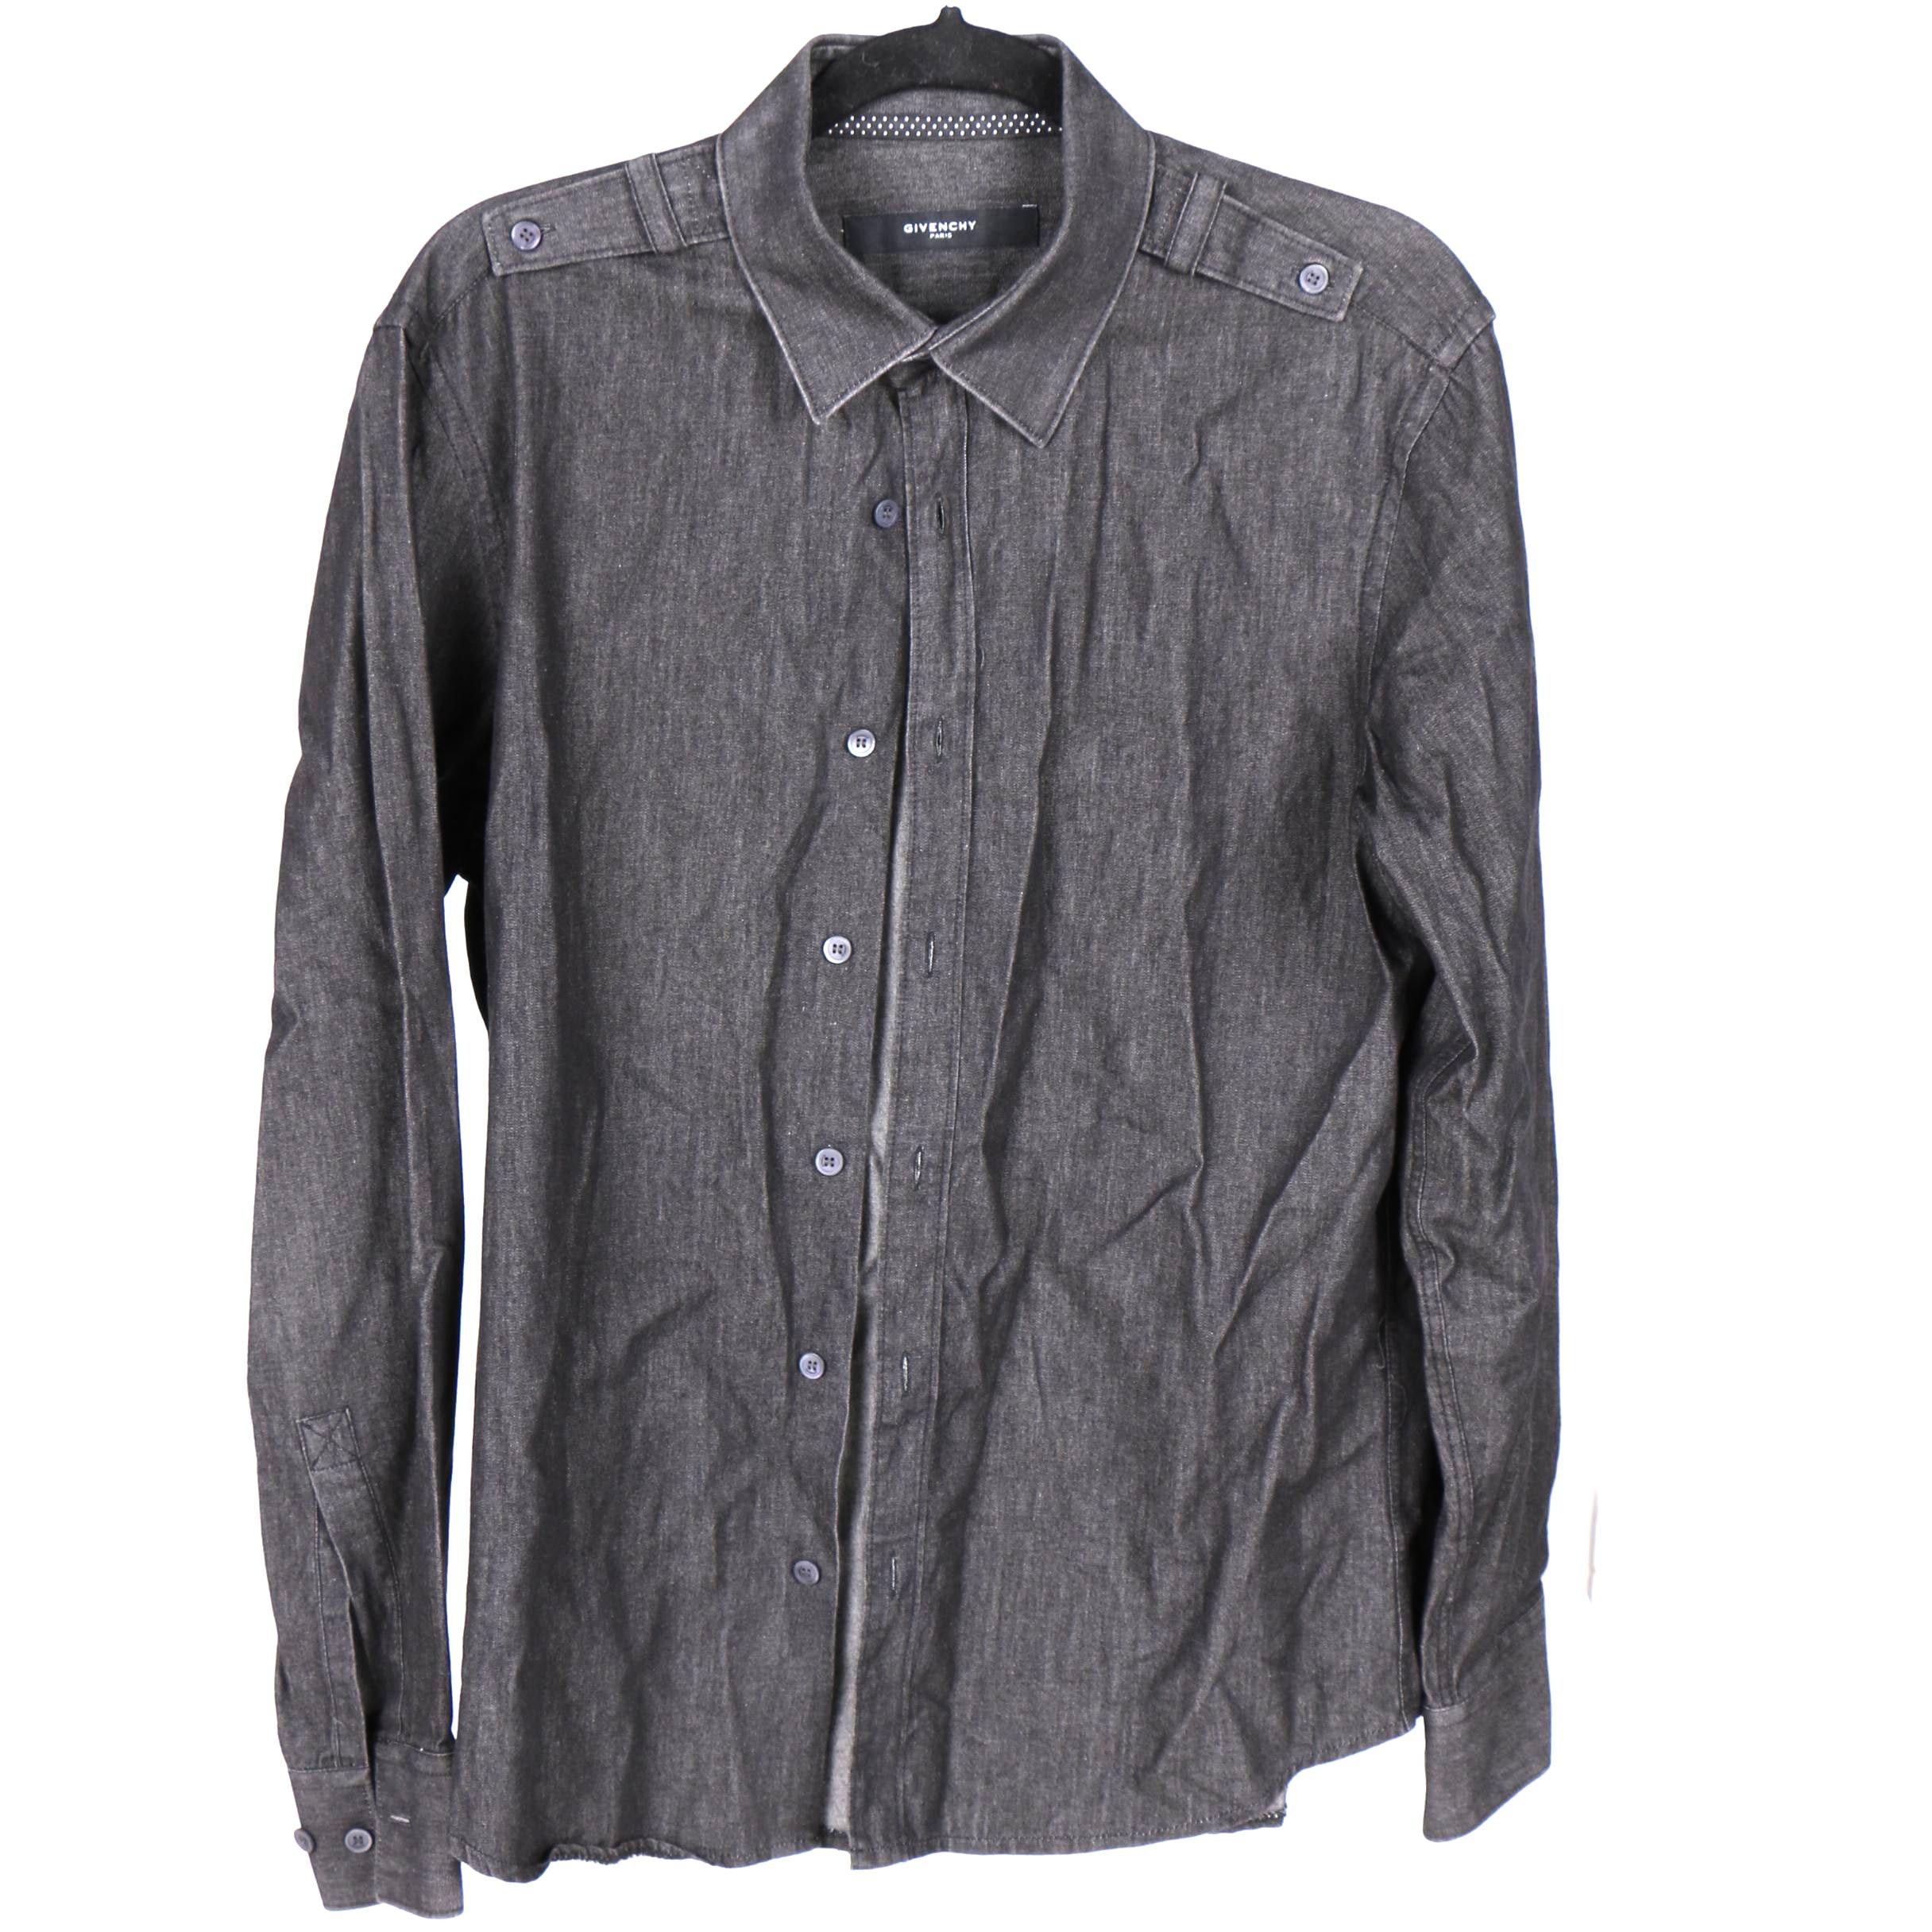 Givenchy Paris  Button Up Shirt